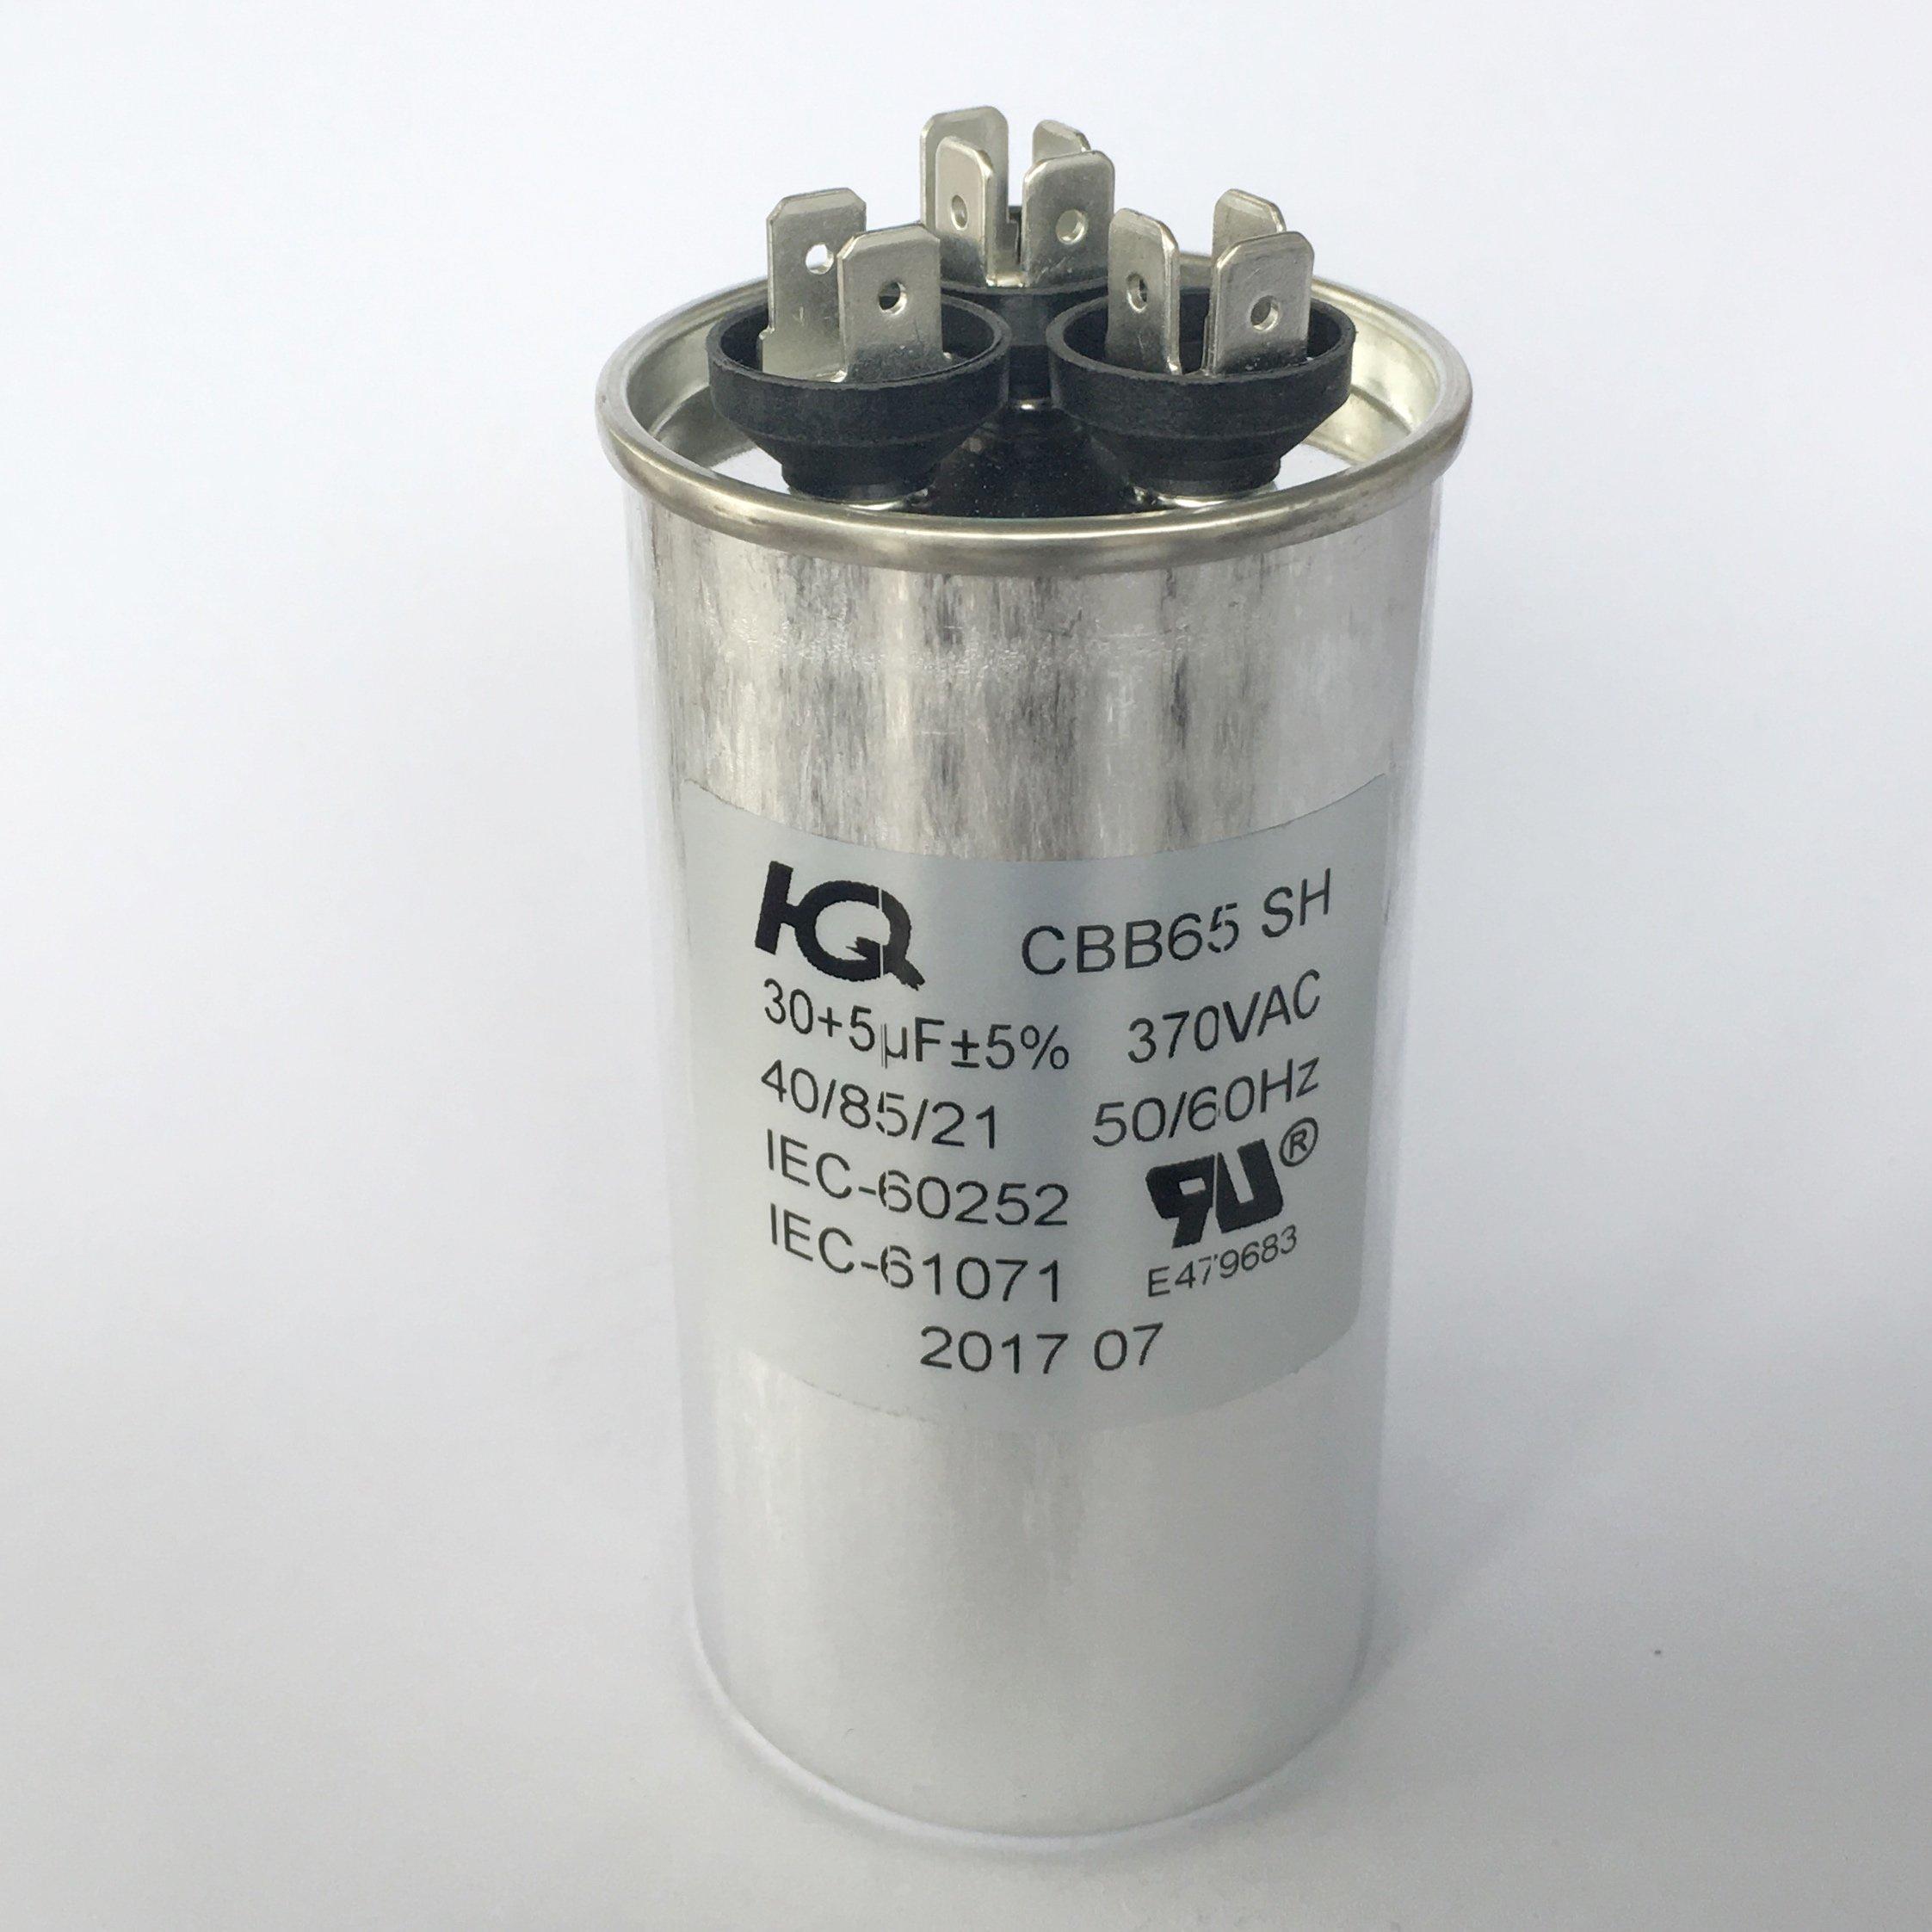 Buy 97F9833 - 30 + 5 uf MFD 370 Volt VAC - Genteq Round Dual Run